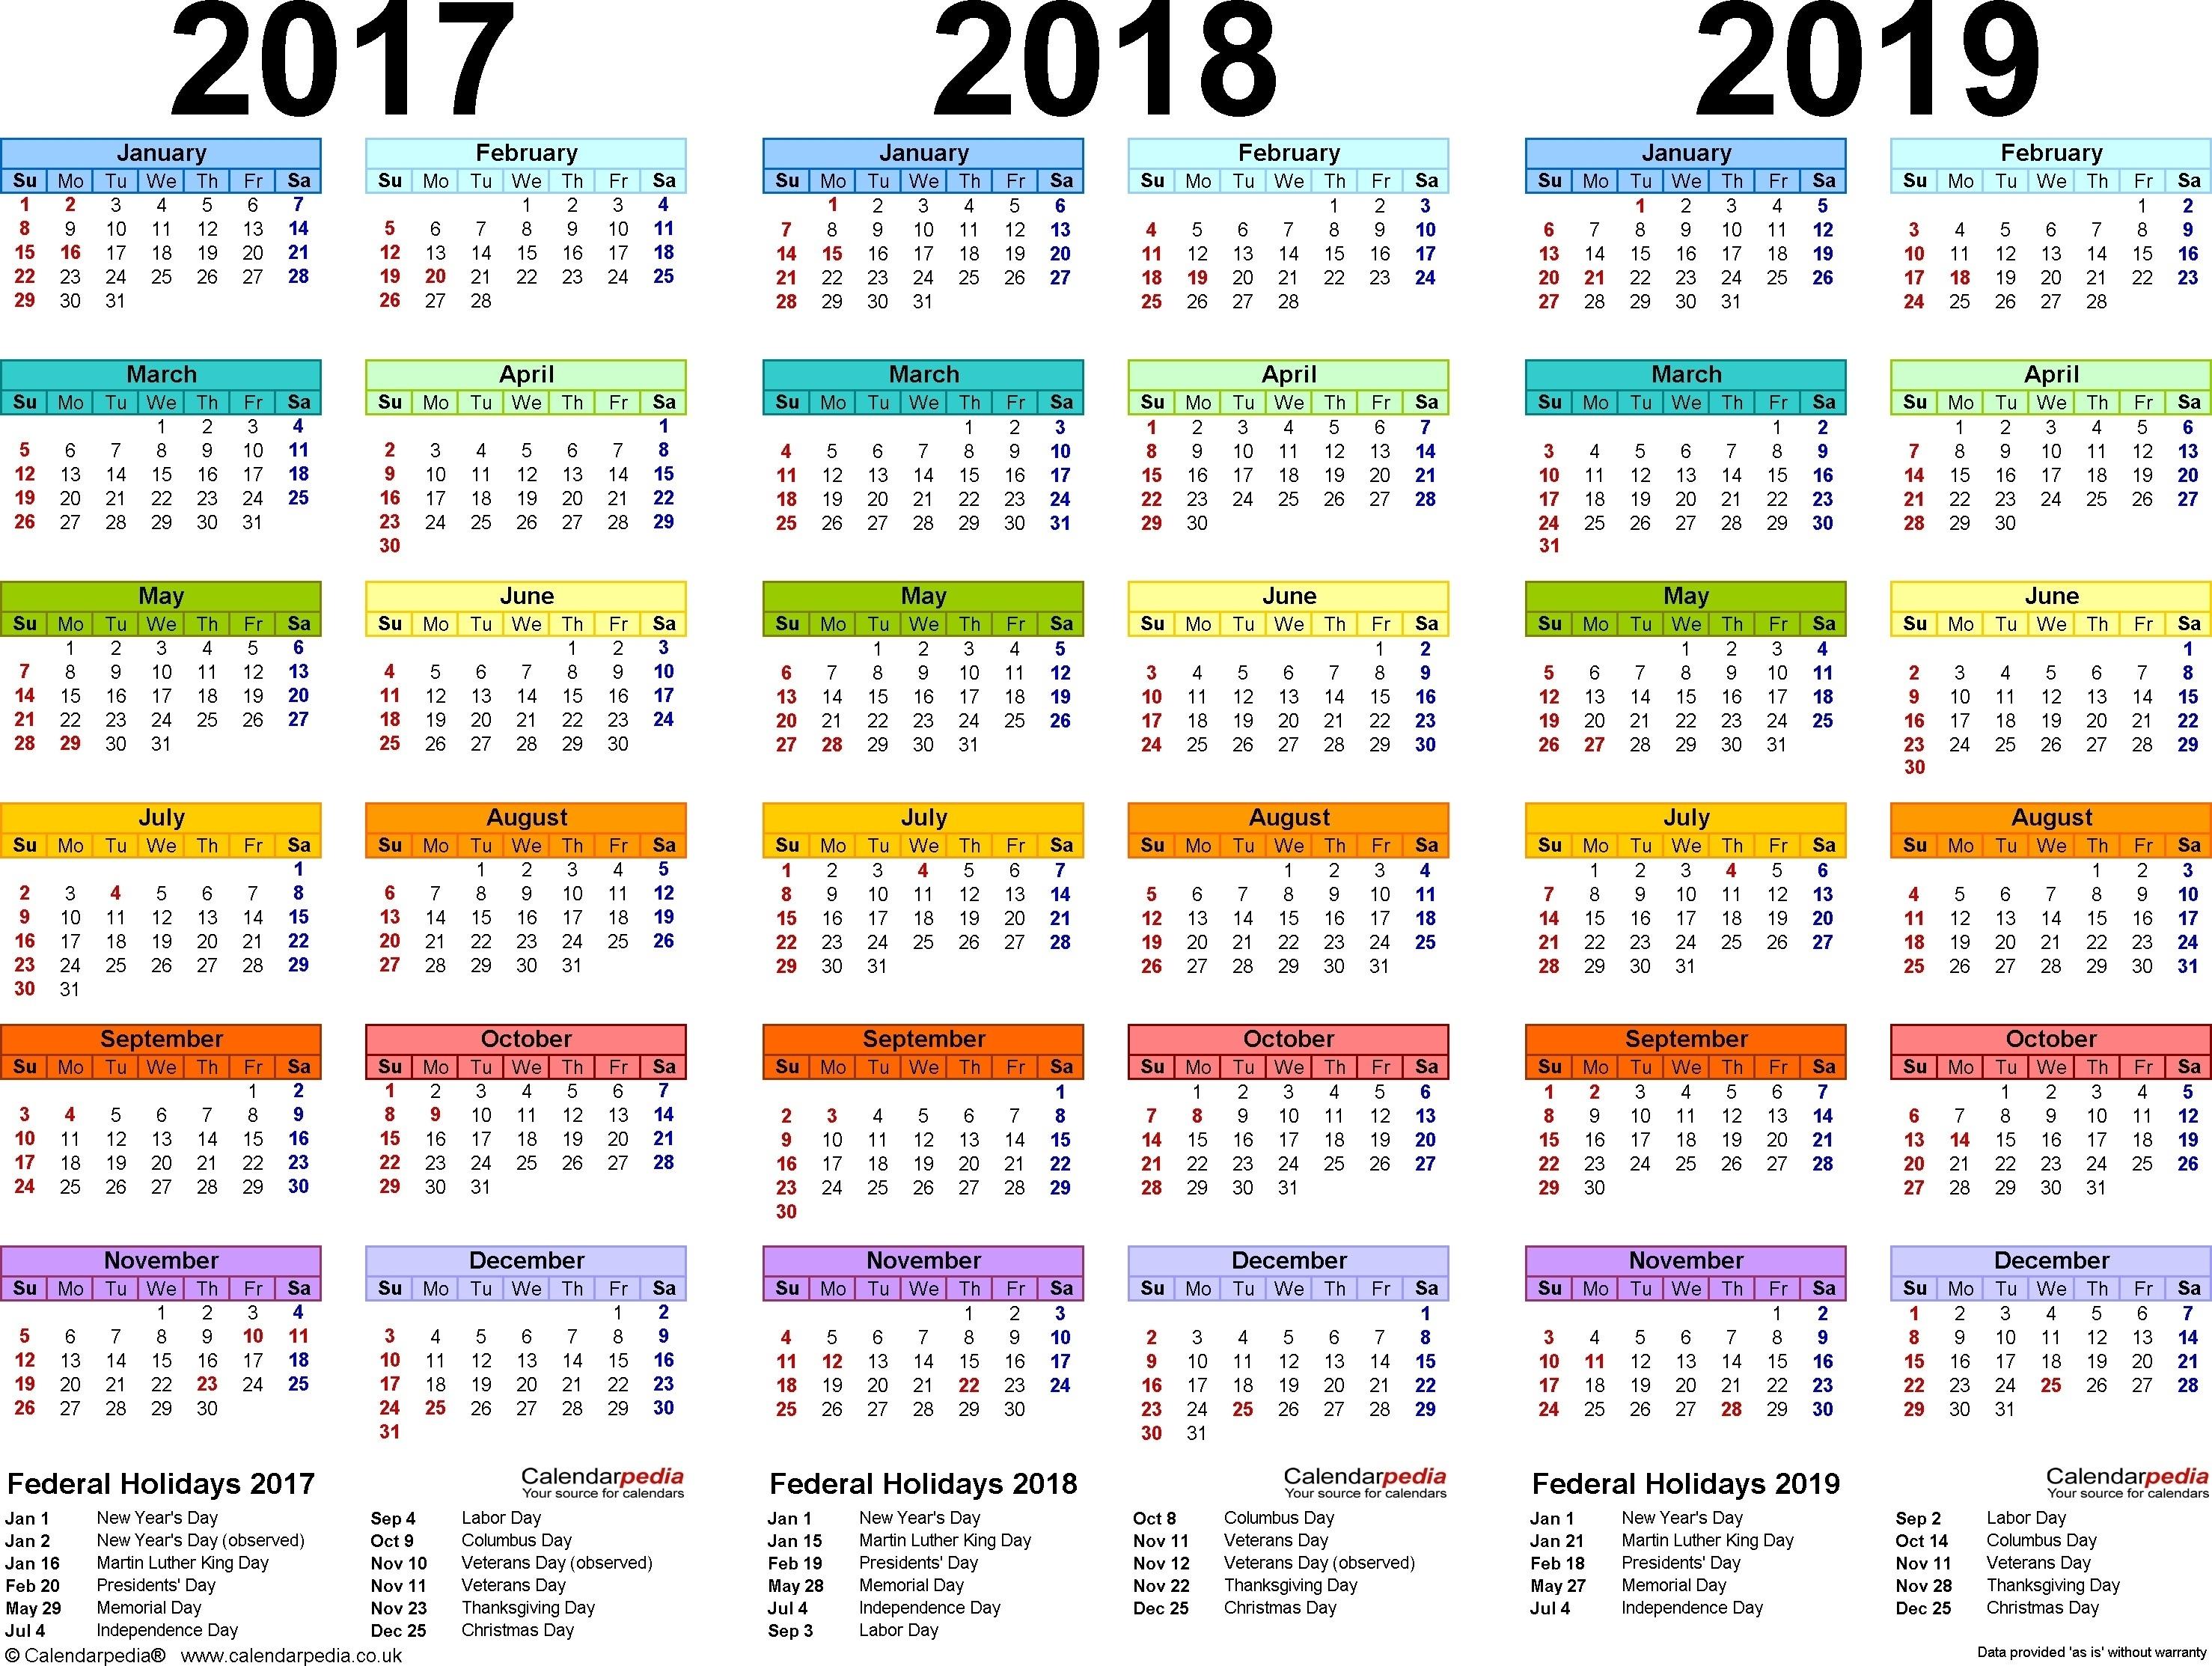 Depo Shot Schedule Chart - Caska Depo Shot Due Date Calendar